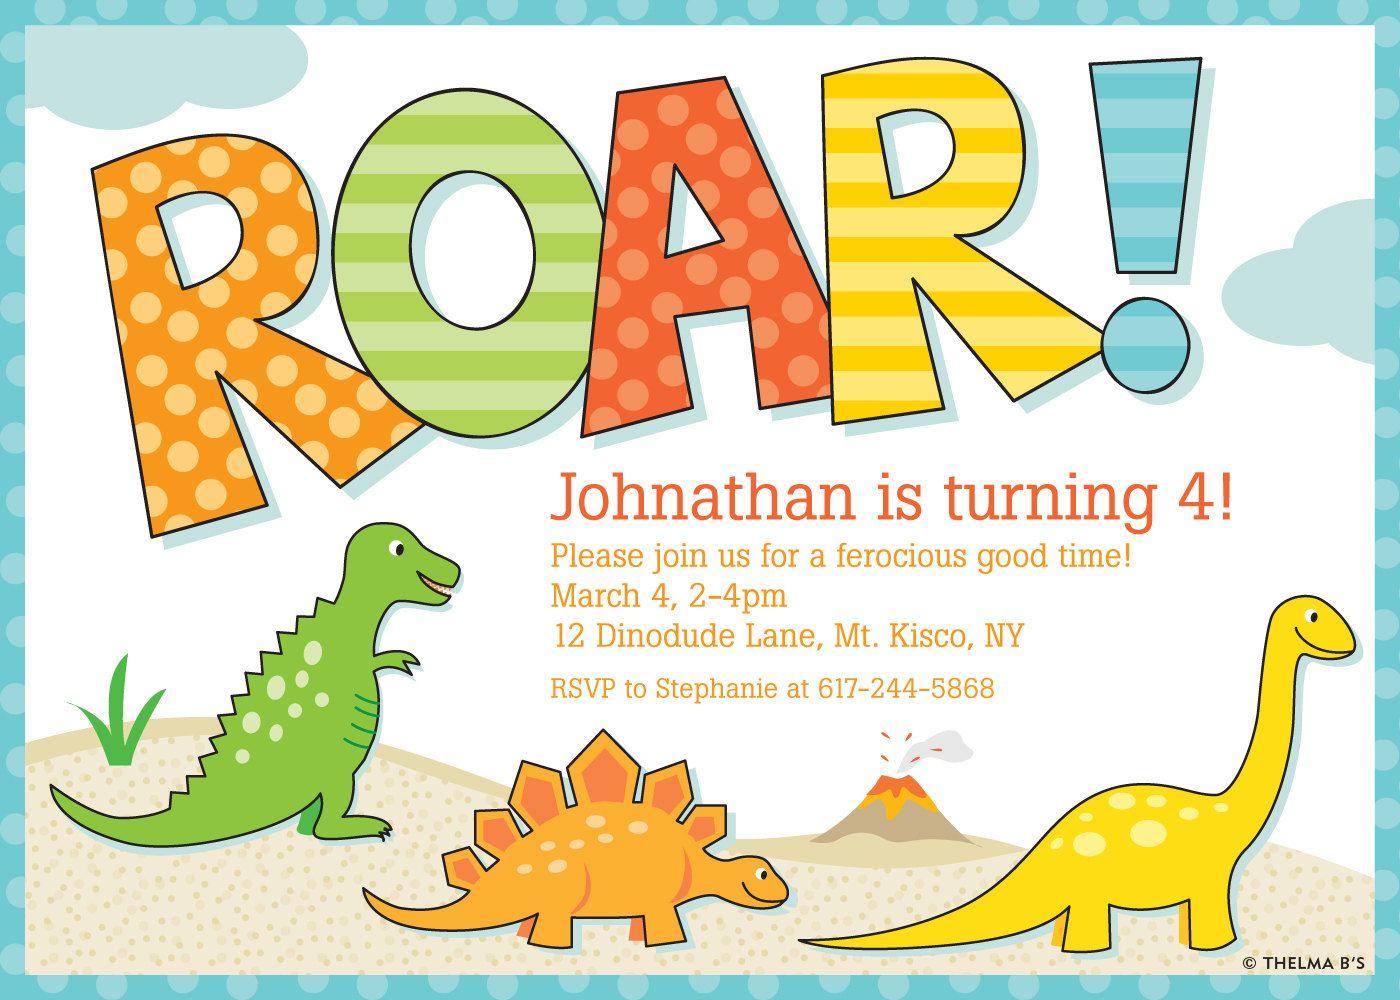 Simple-Dinosaur-Birthday-Invitations.jpg (1400×1000) | Liam's Dino ...